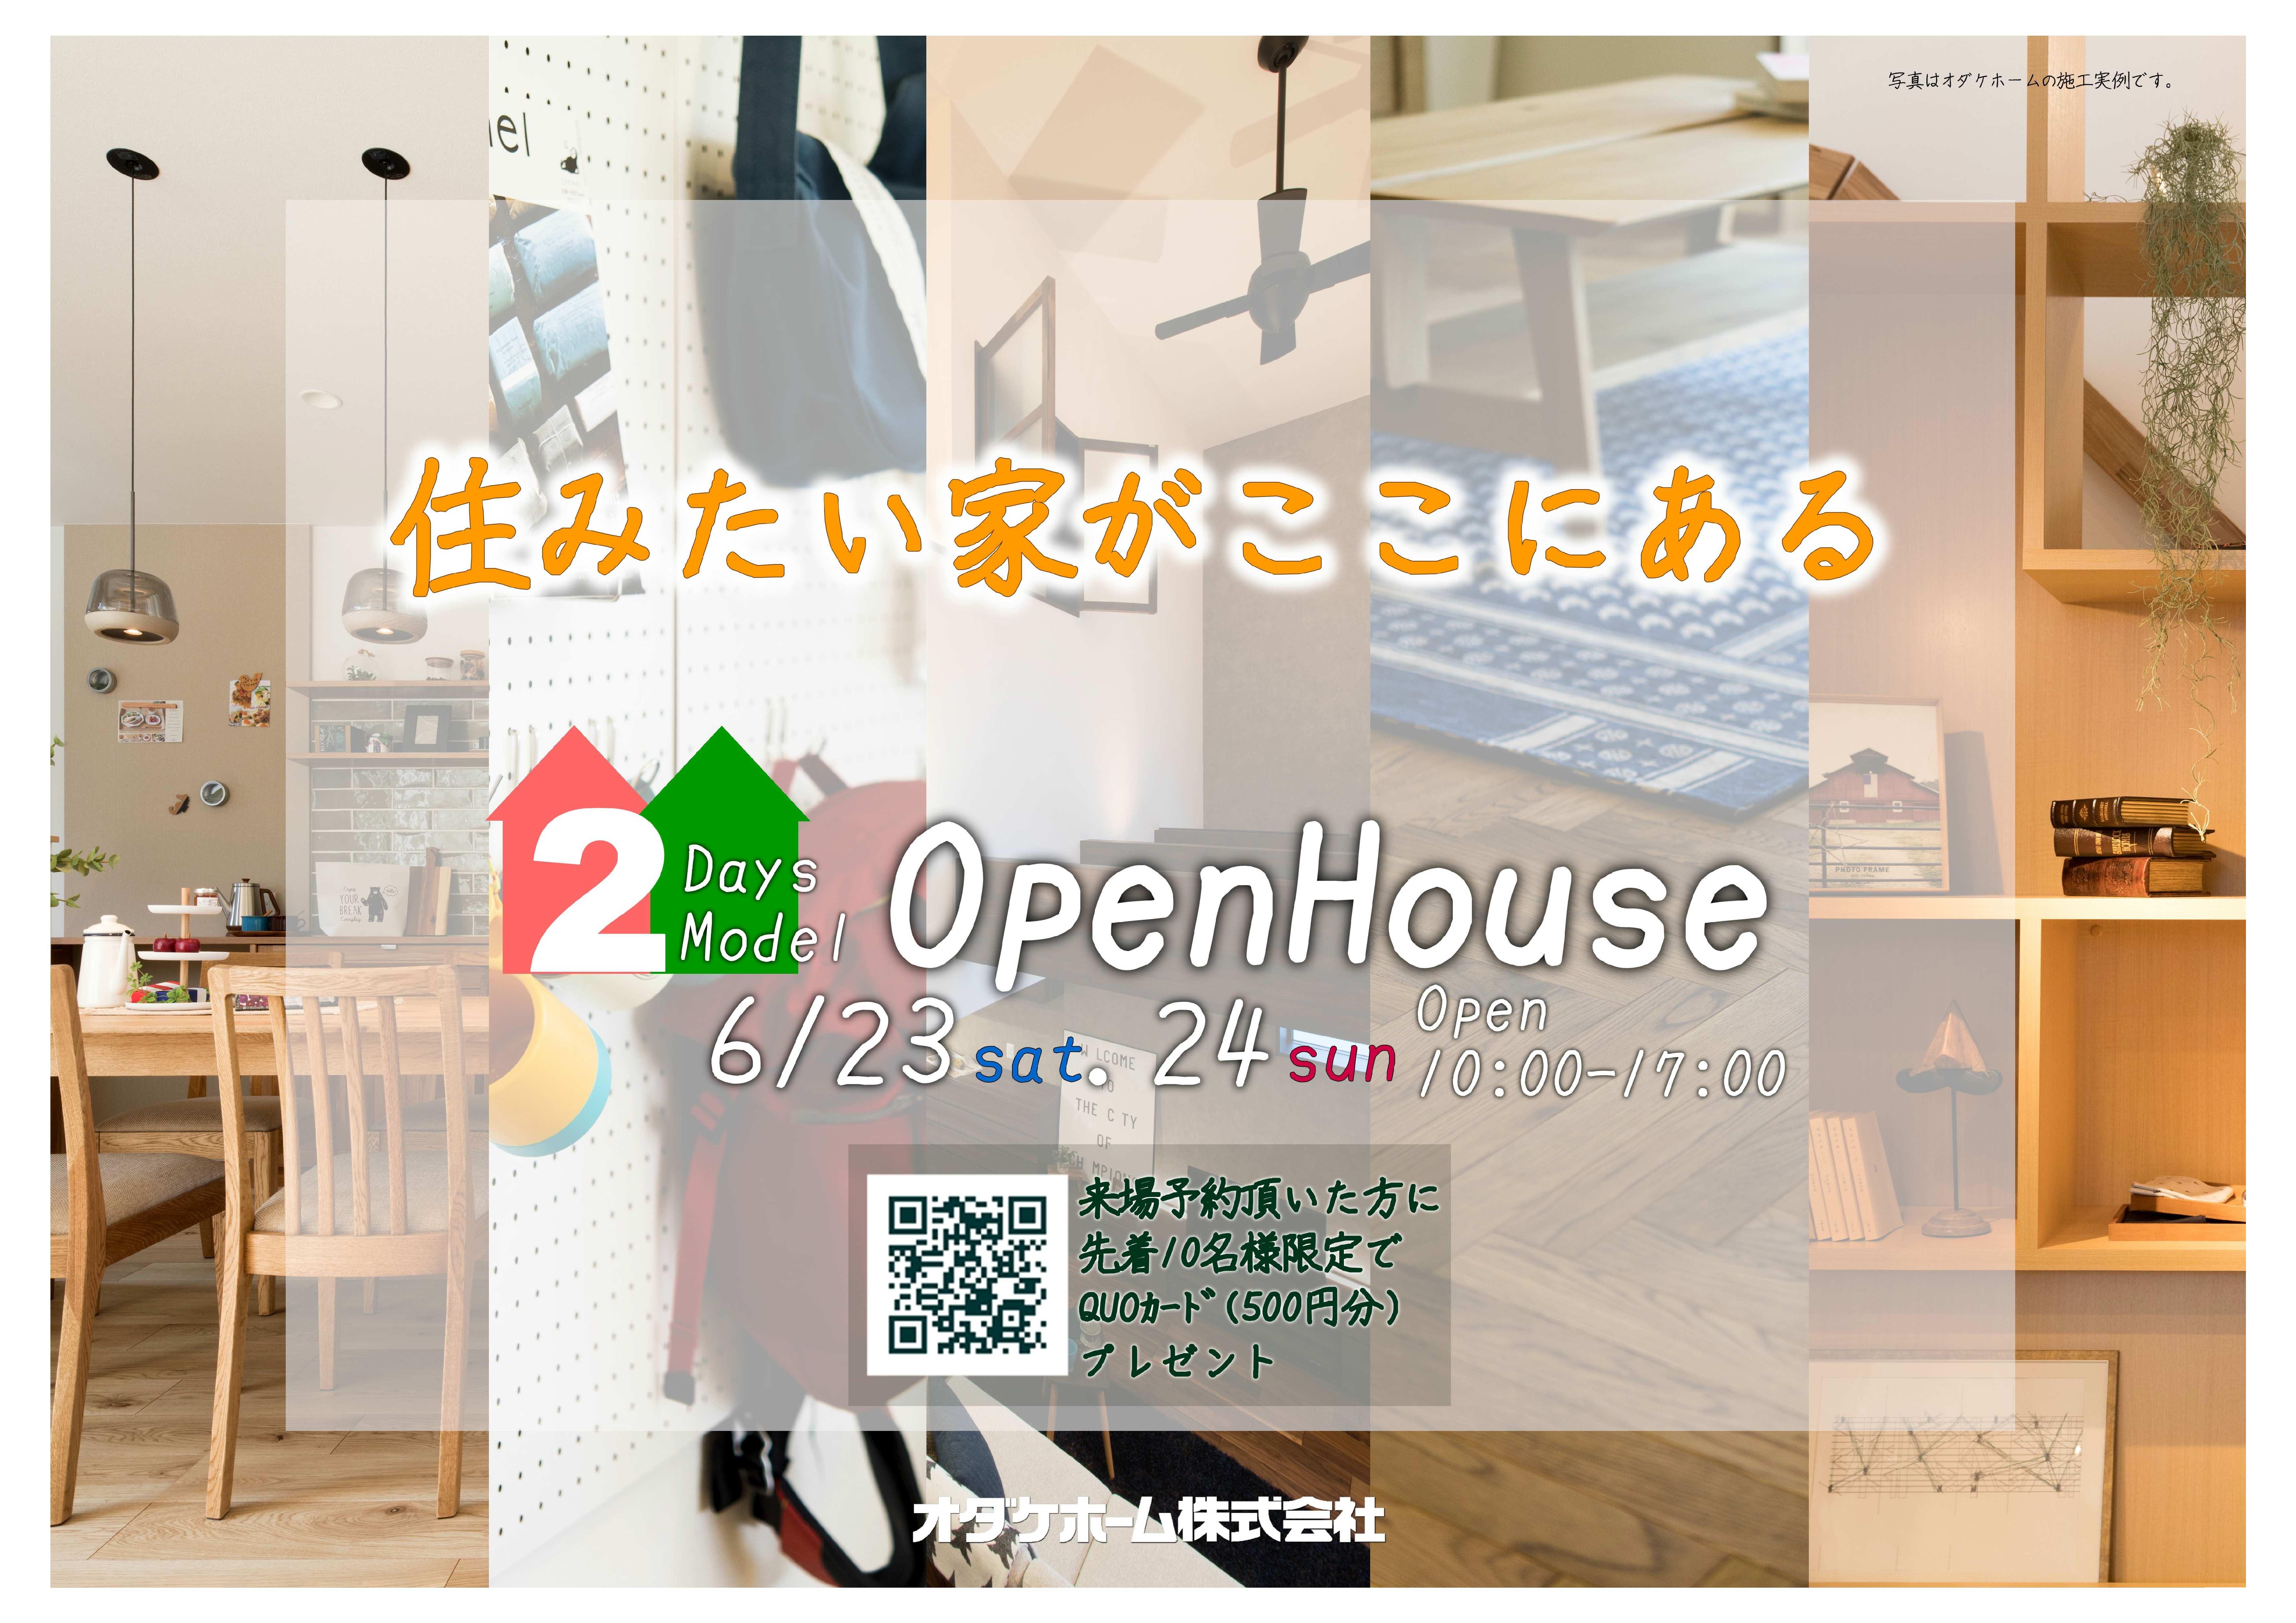 6/23(土)~24(日)富山市上大久保モデルOPEN HOUSE